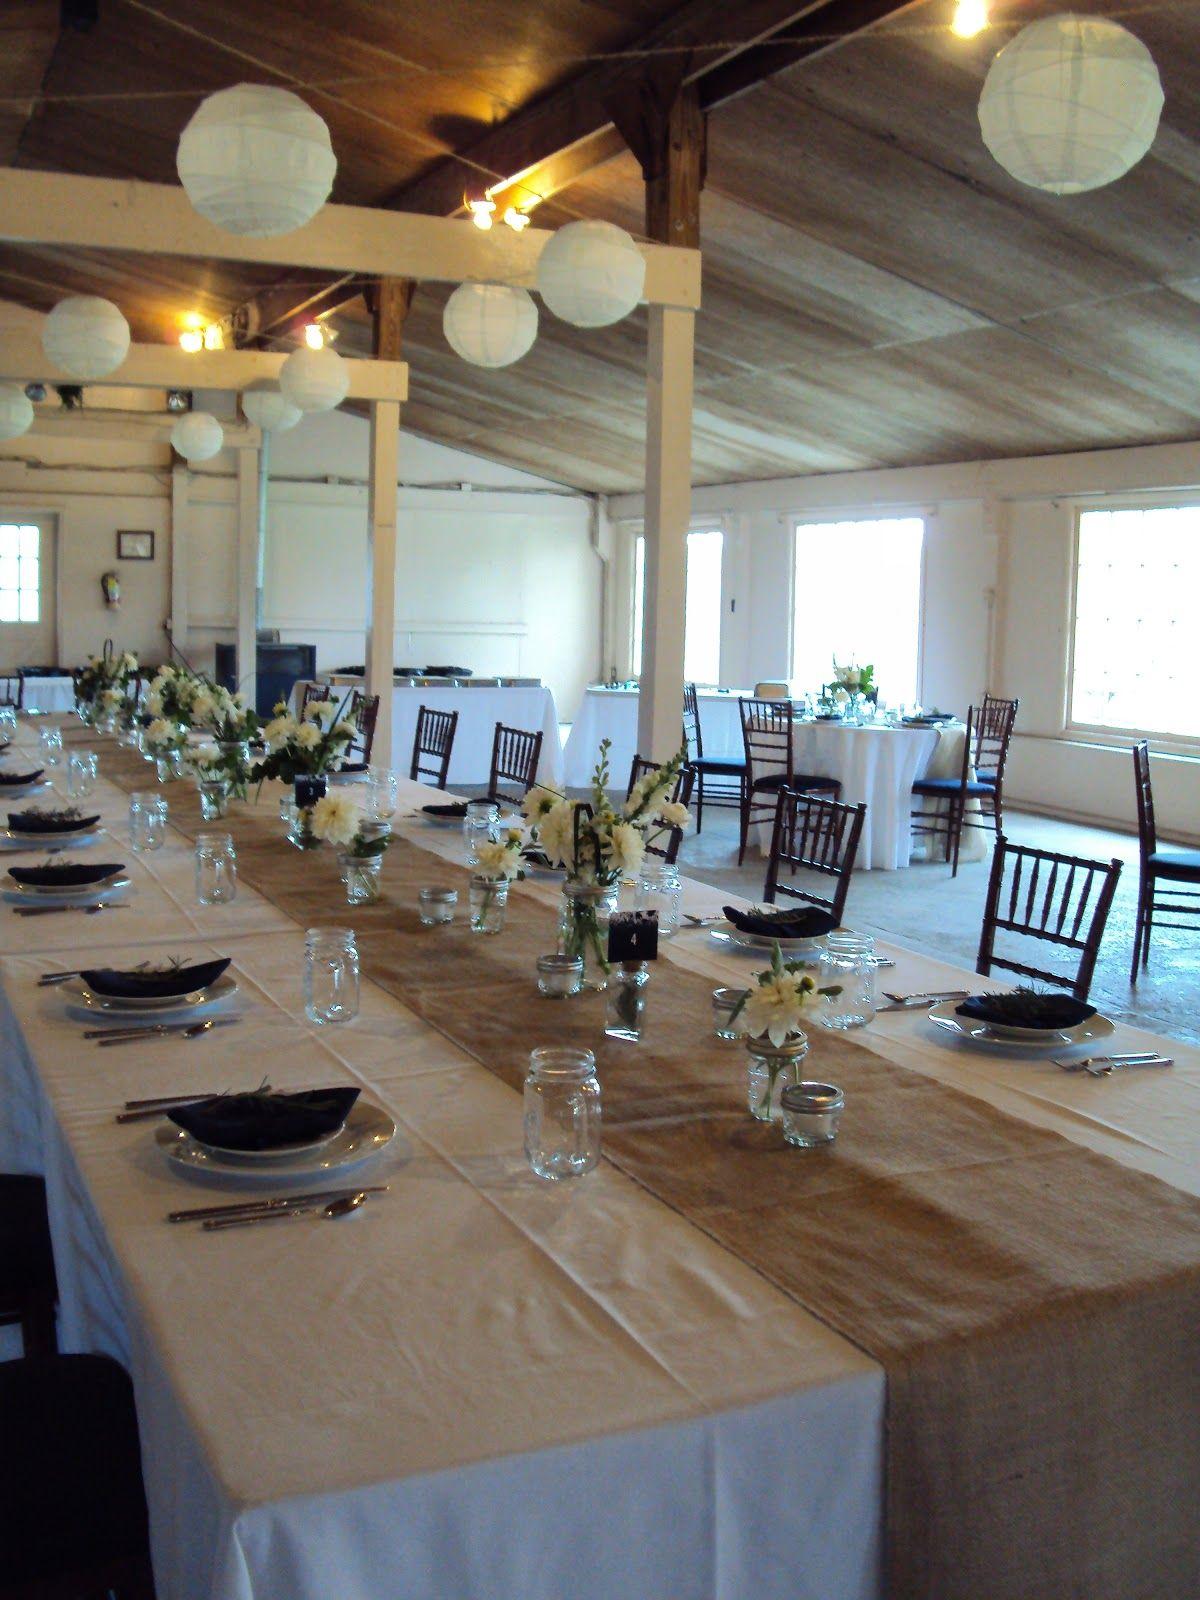 Smokey Glen Farm Wedding Burlap Table Runner Rustic Head Tables Barbecue Wedding Rustic Vintage Wedding